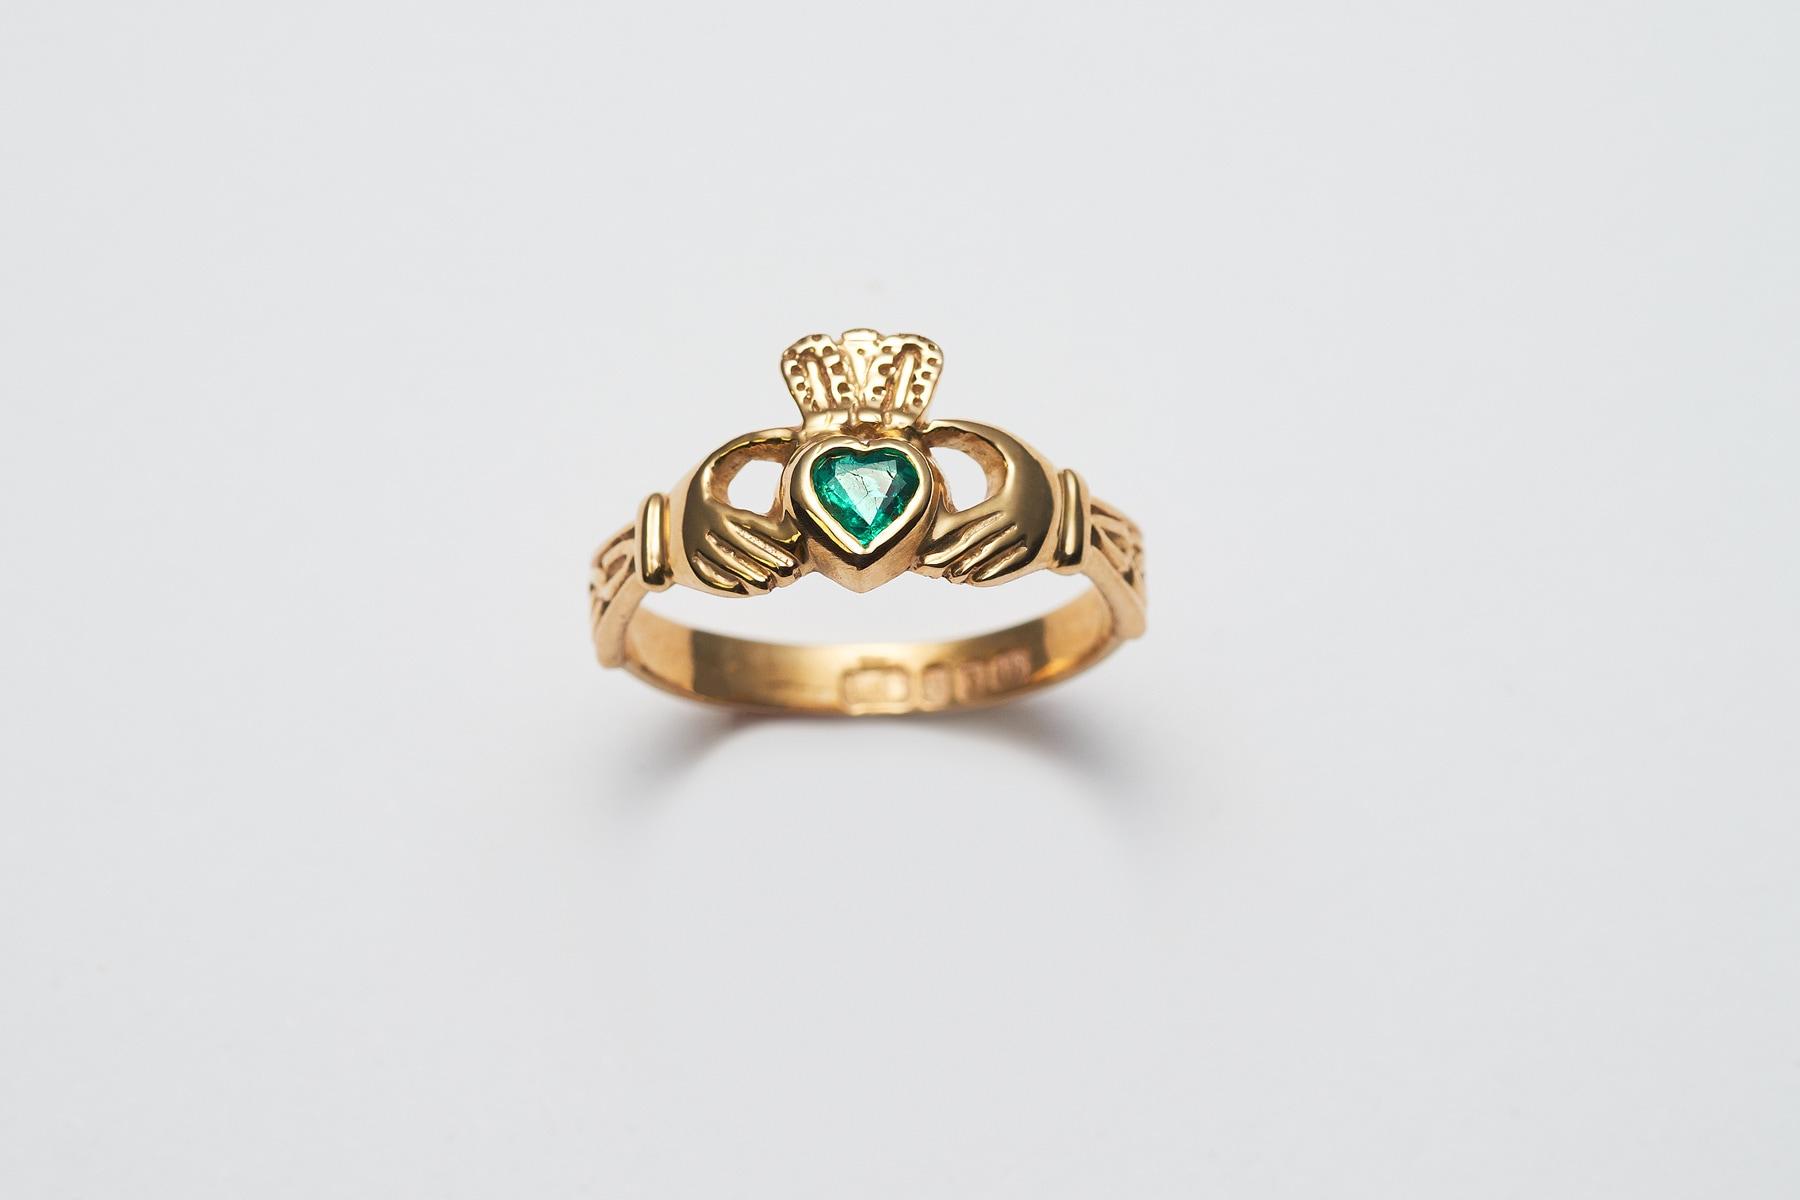 Emerald and Diamond Claddagh Ring.